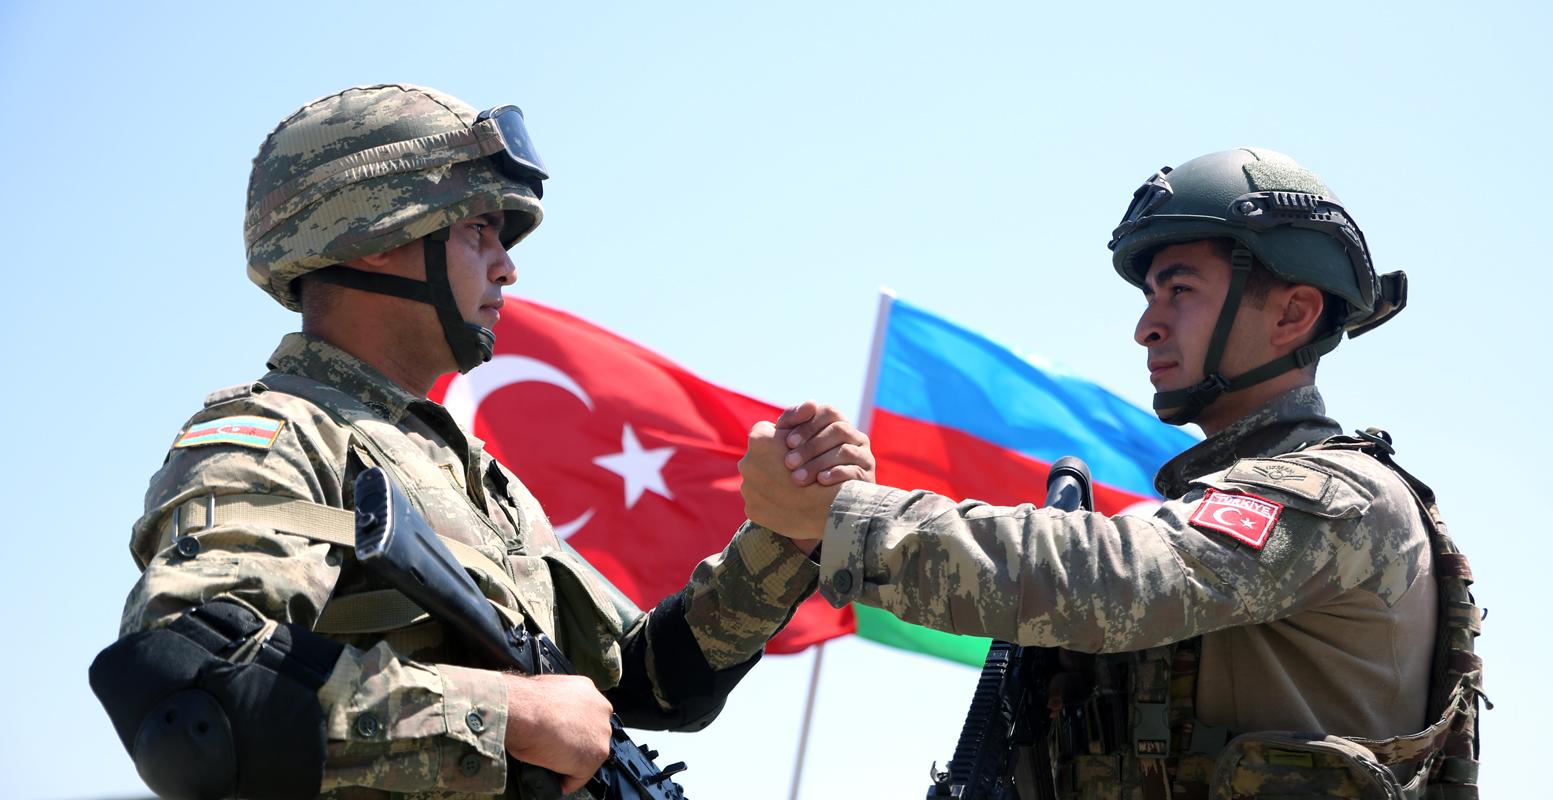 СаммитЕС: Турции удалось избежать санкций (Sözcü)